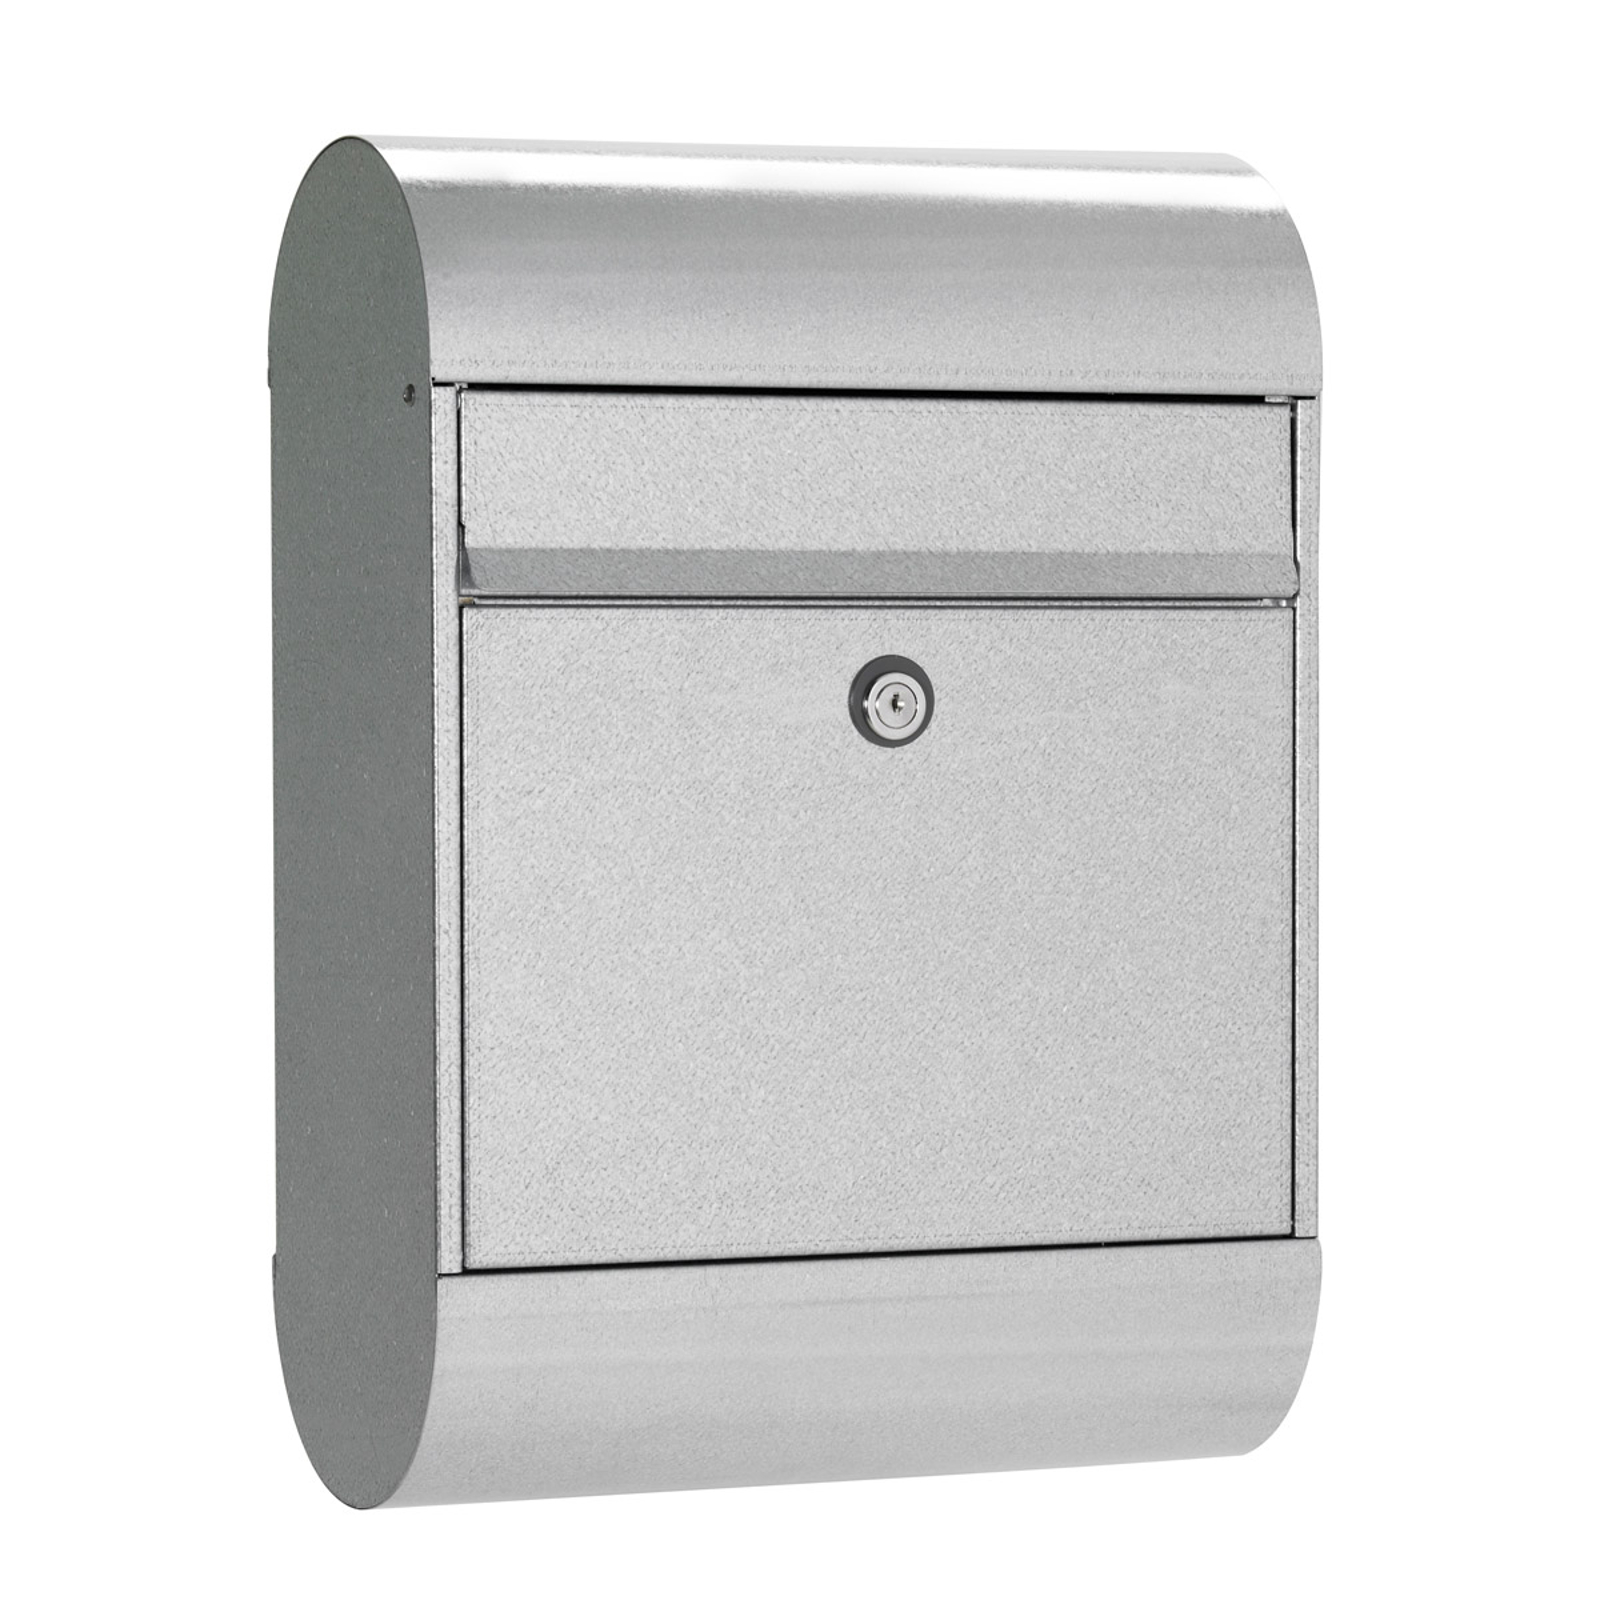 Skandinavisk postkasse 6000, stål